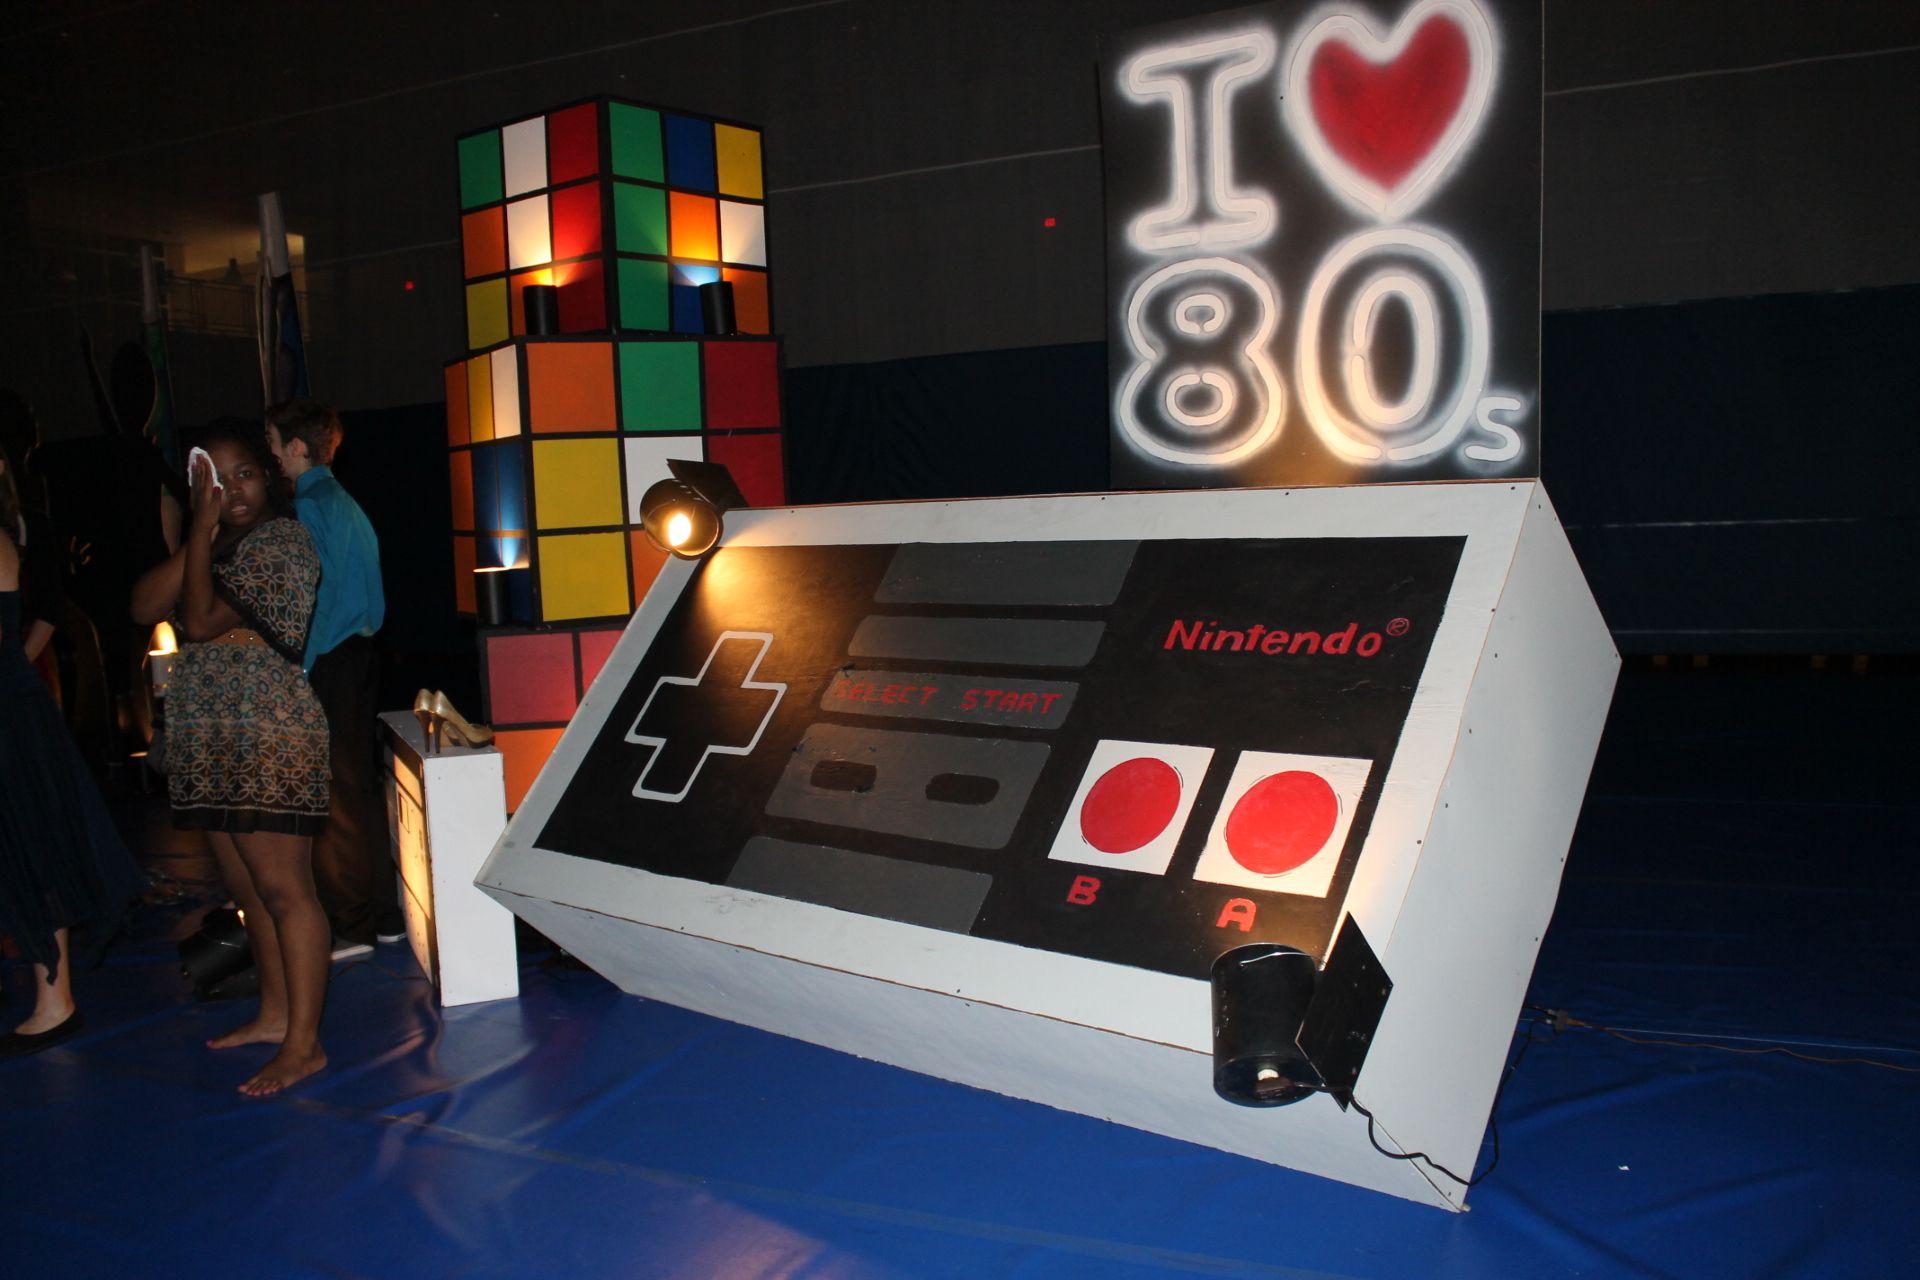 CASHS Arcade games, dance, Gaming